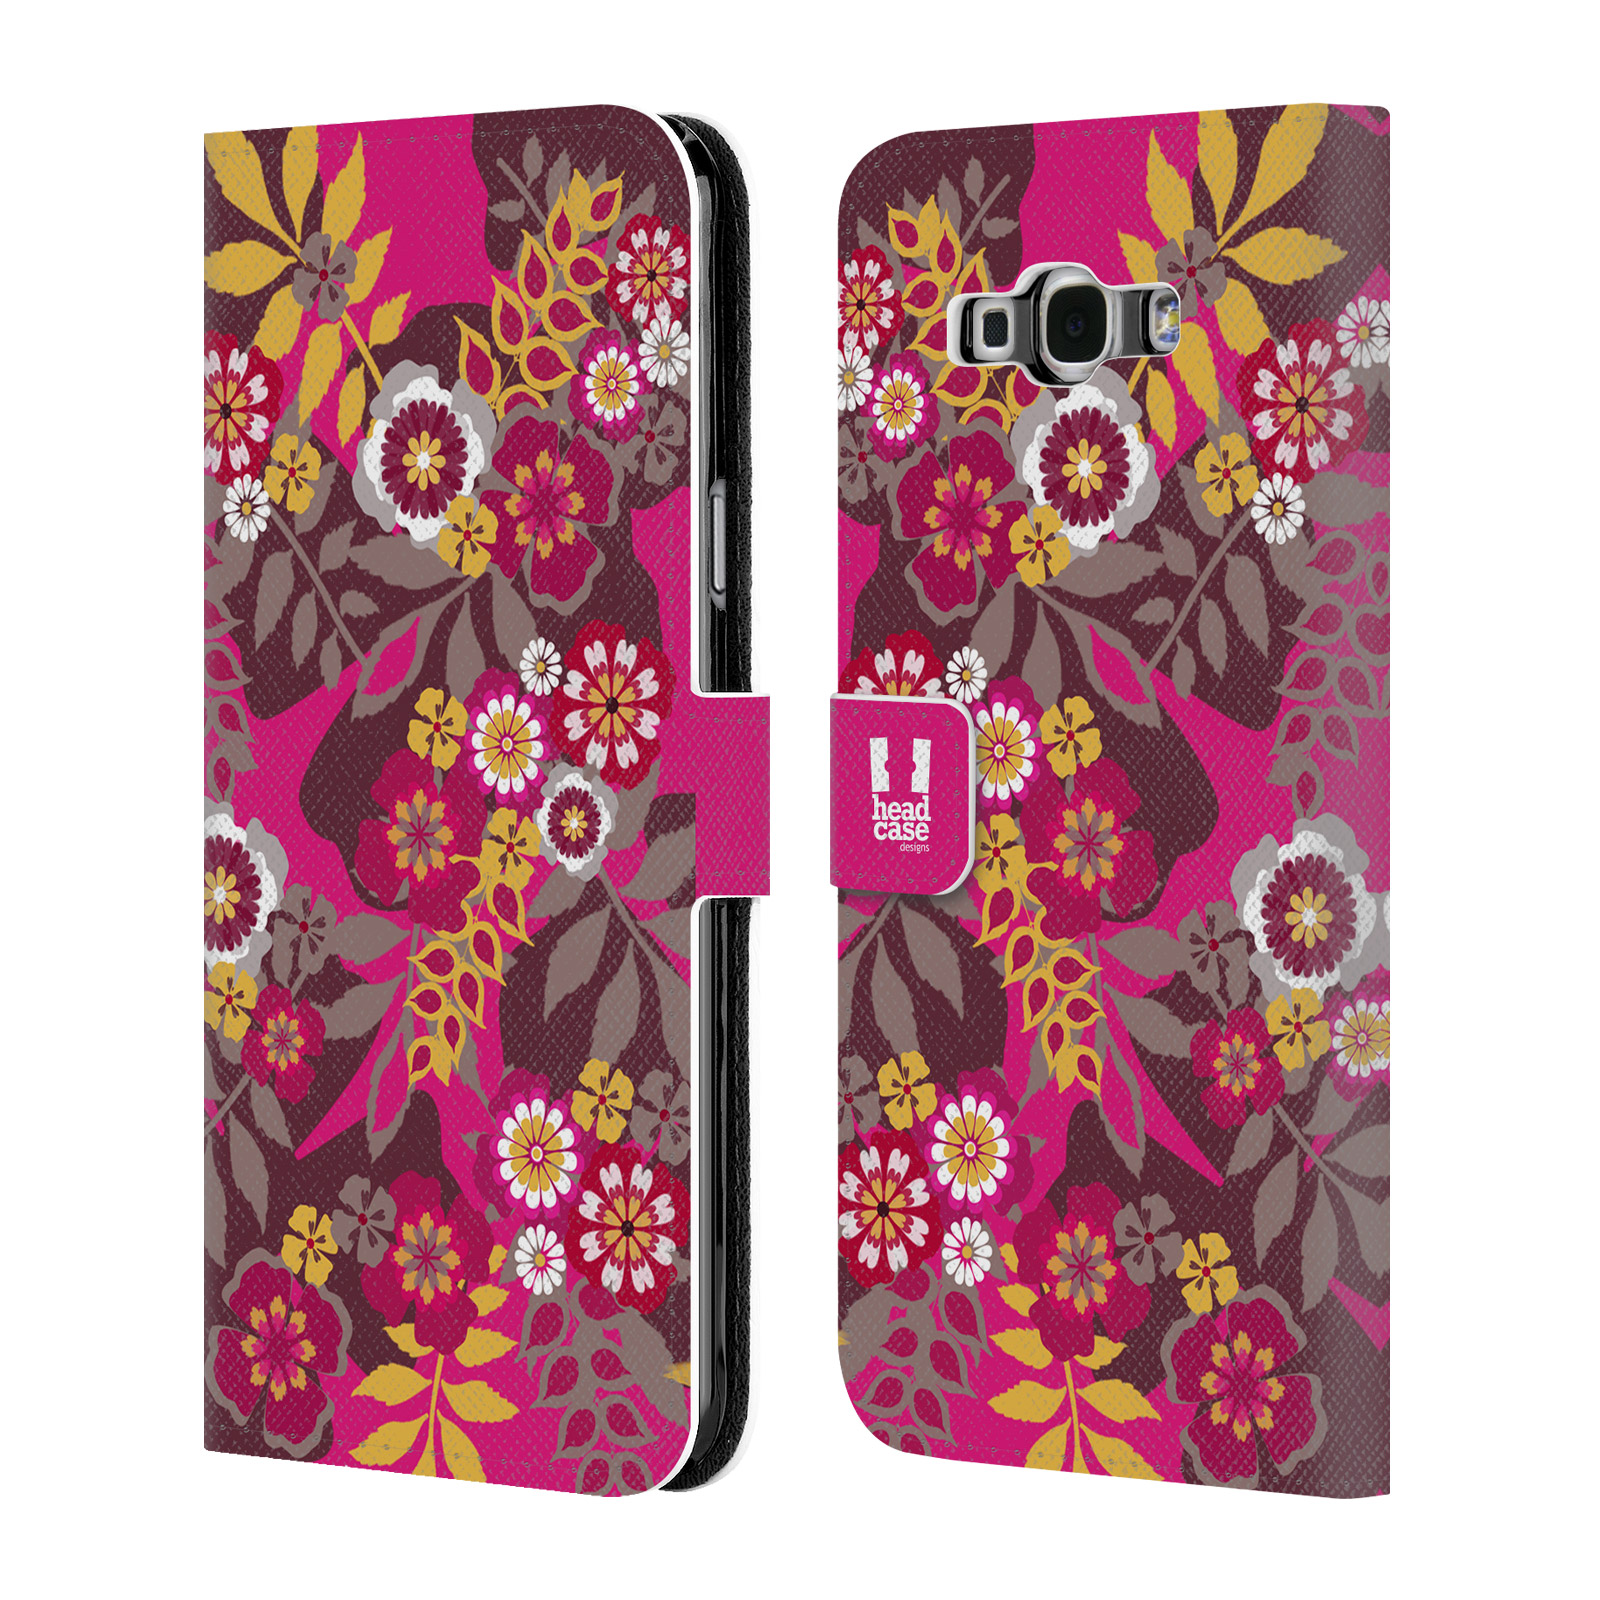 HEAD CASE Flipové pouzdro pro mobil Samsung Galaxy A8 BOTANIKA růžová a hnědá